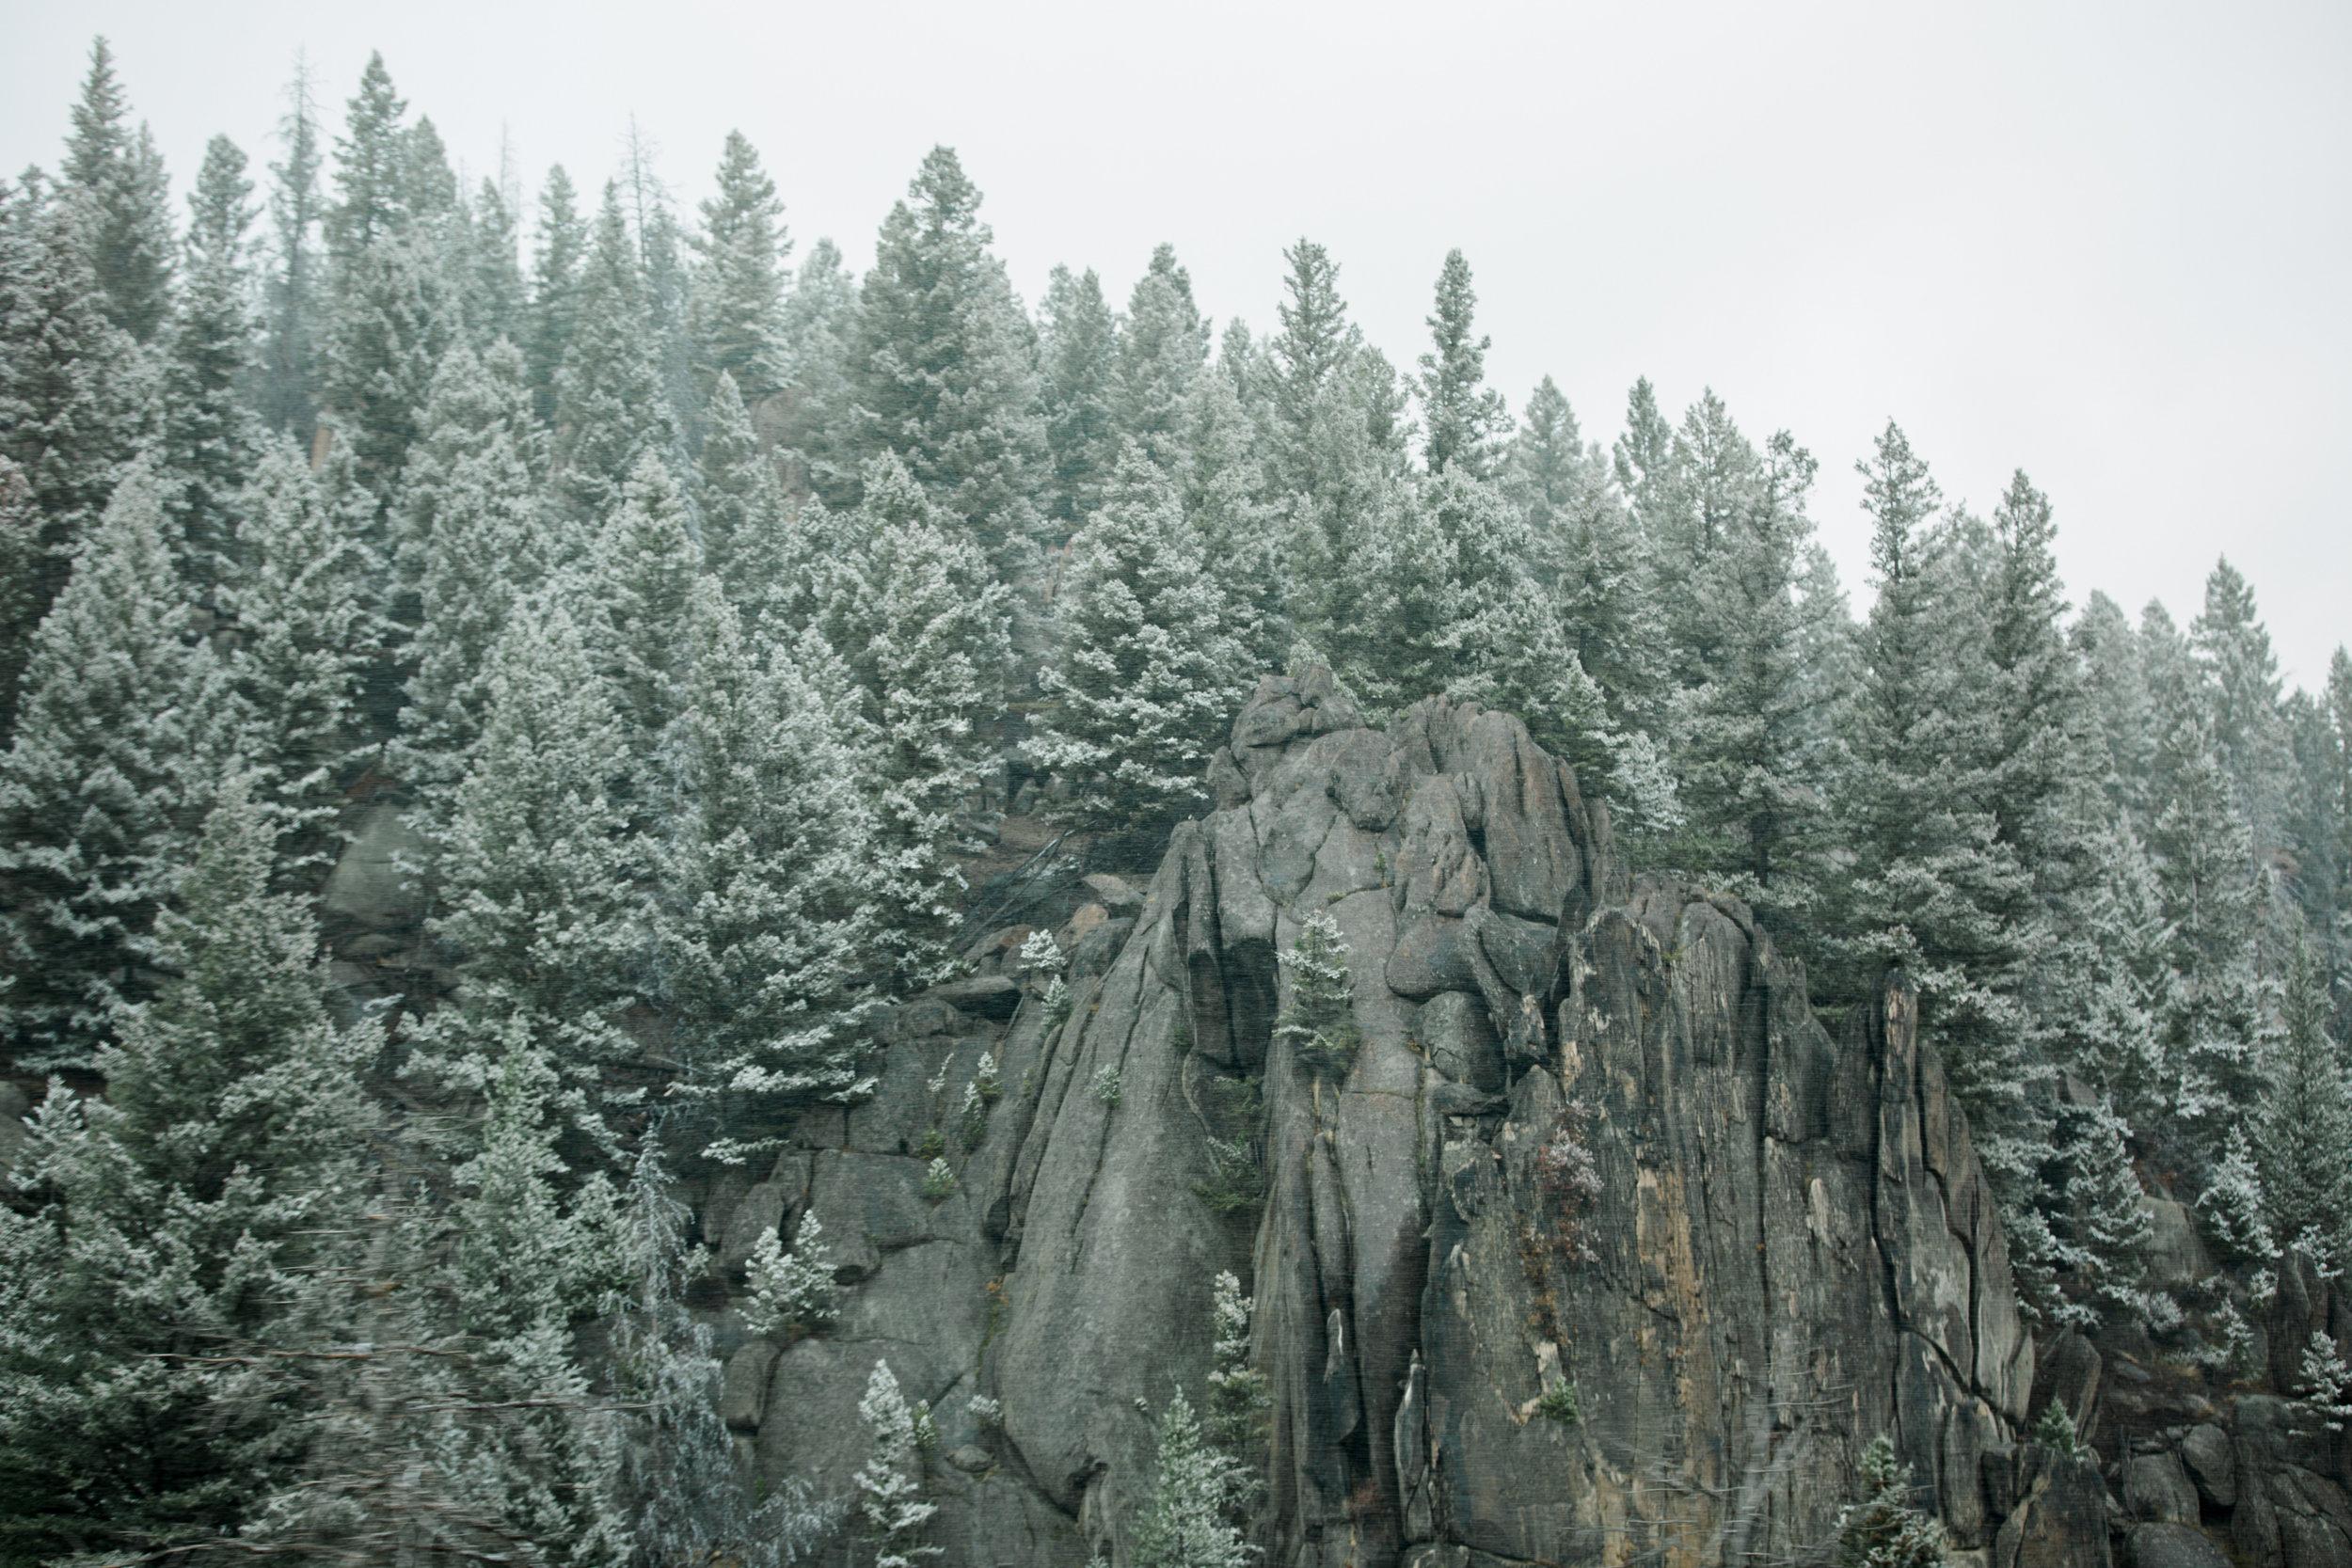 CindyGiovagnoli_outdoor_adventure_photography_Grand_Teton_Yellowstone_Glacier_National_Park_Montana_Wyoming_South_Dakota_Mount_Rushmore_Badlands-017.jpg